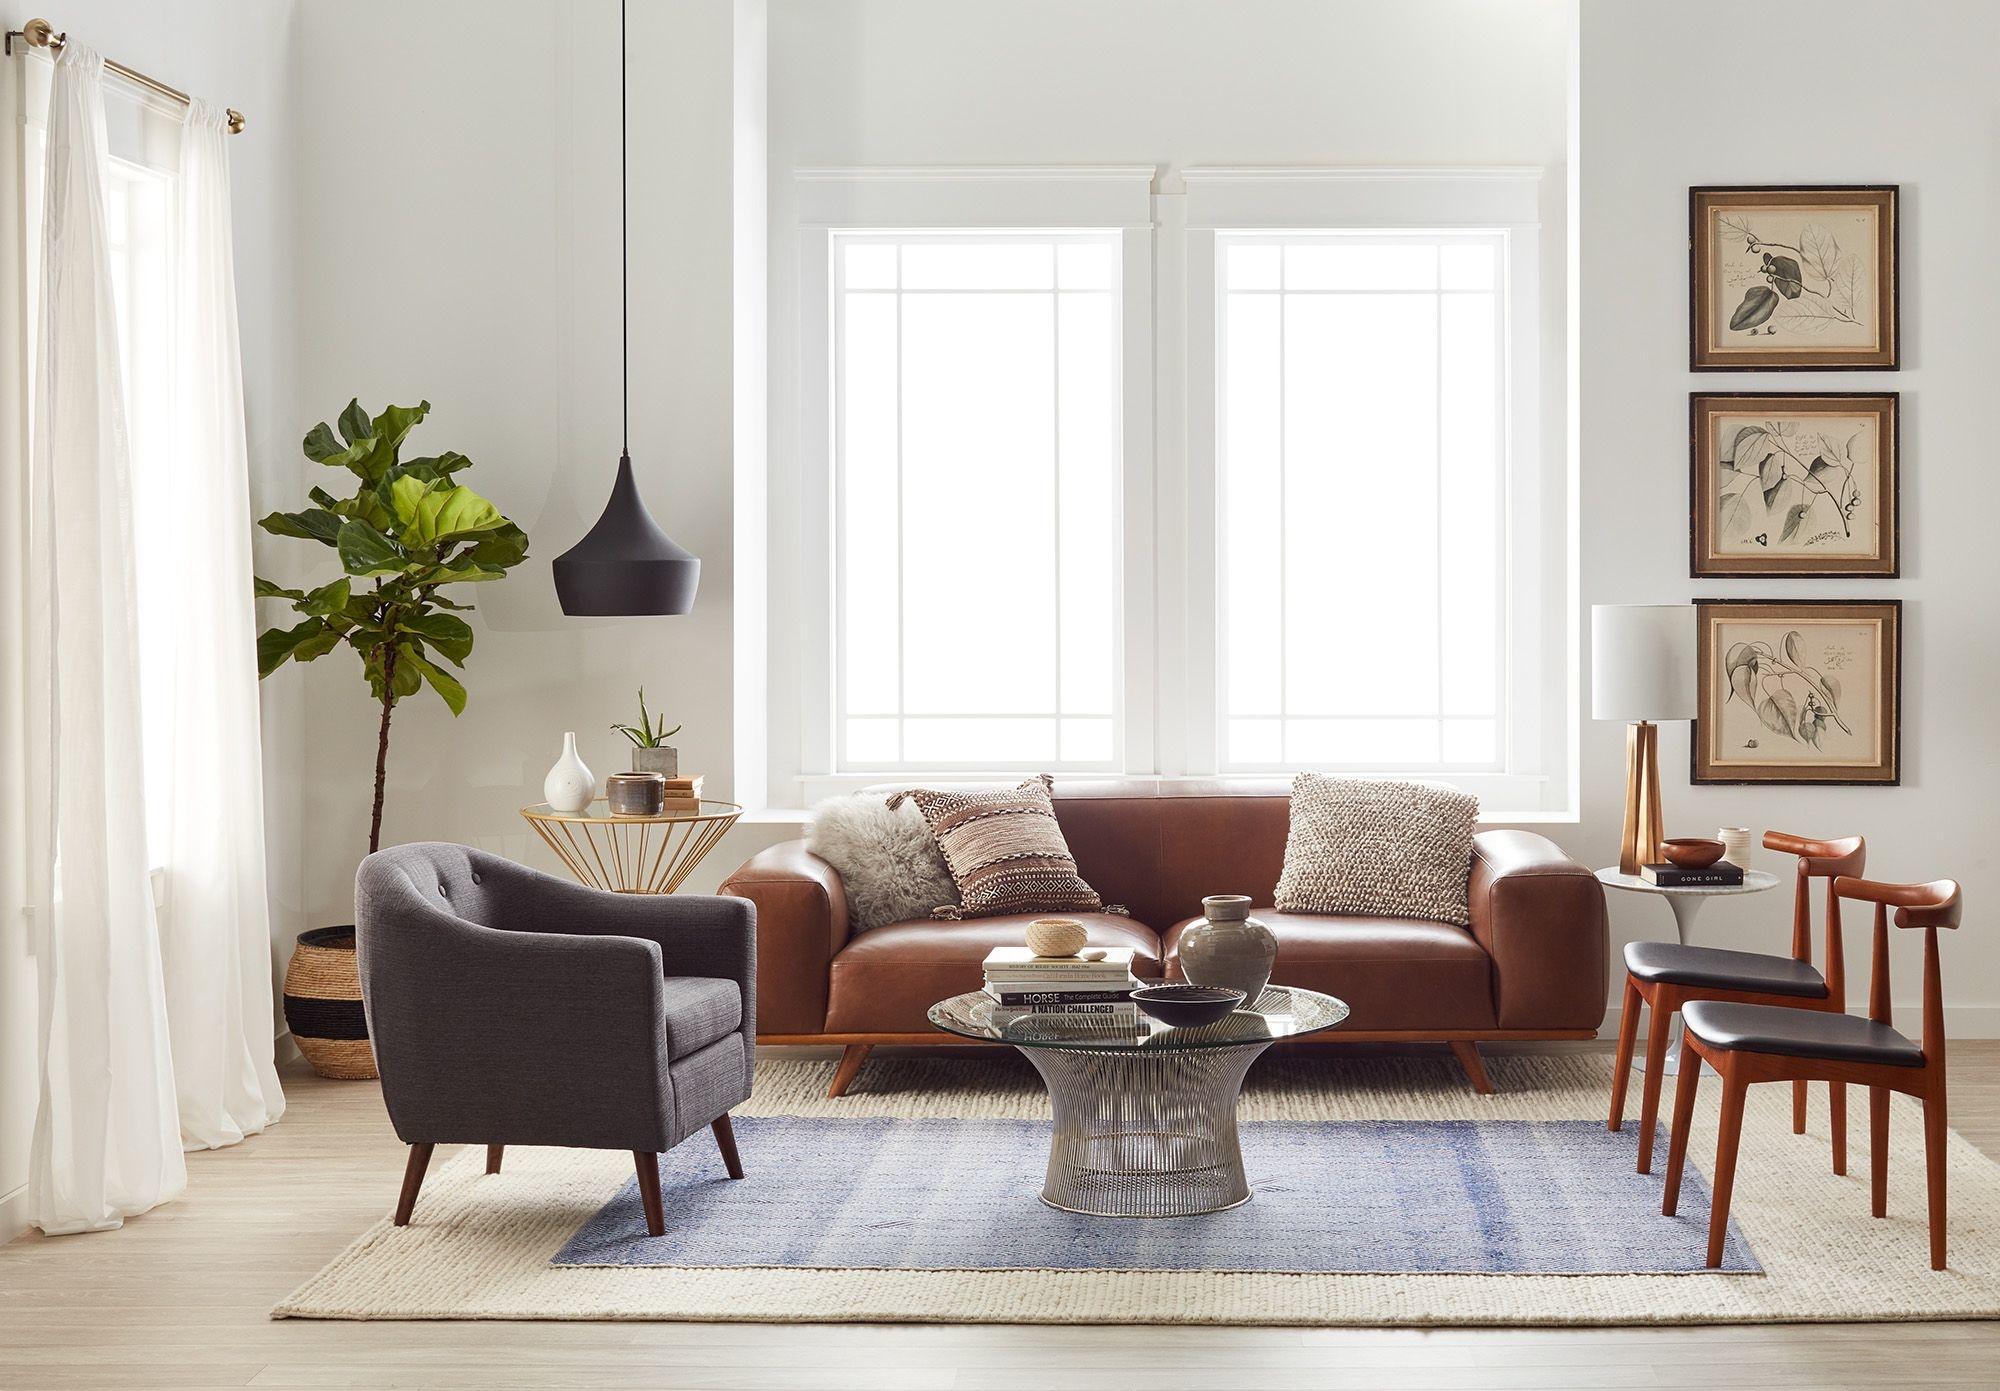 The Ideal interior